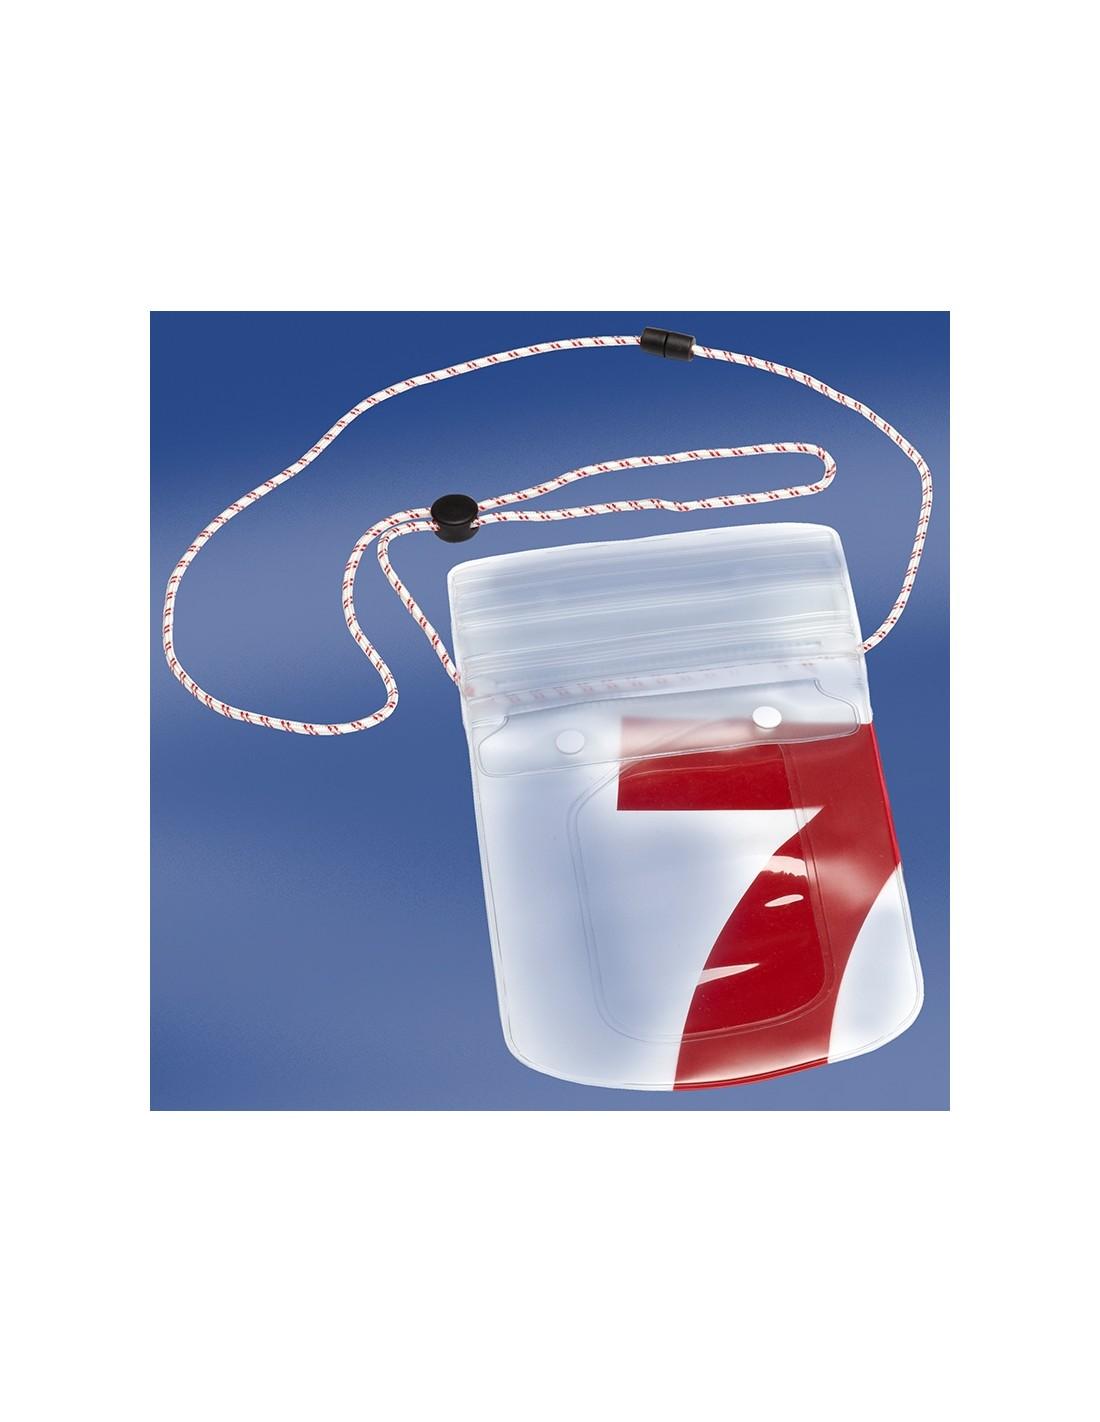 Waterdichte Telefoonhoes - Sea Pouch - Rood